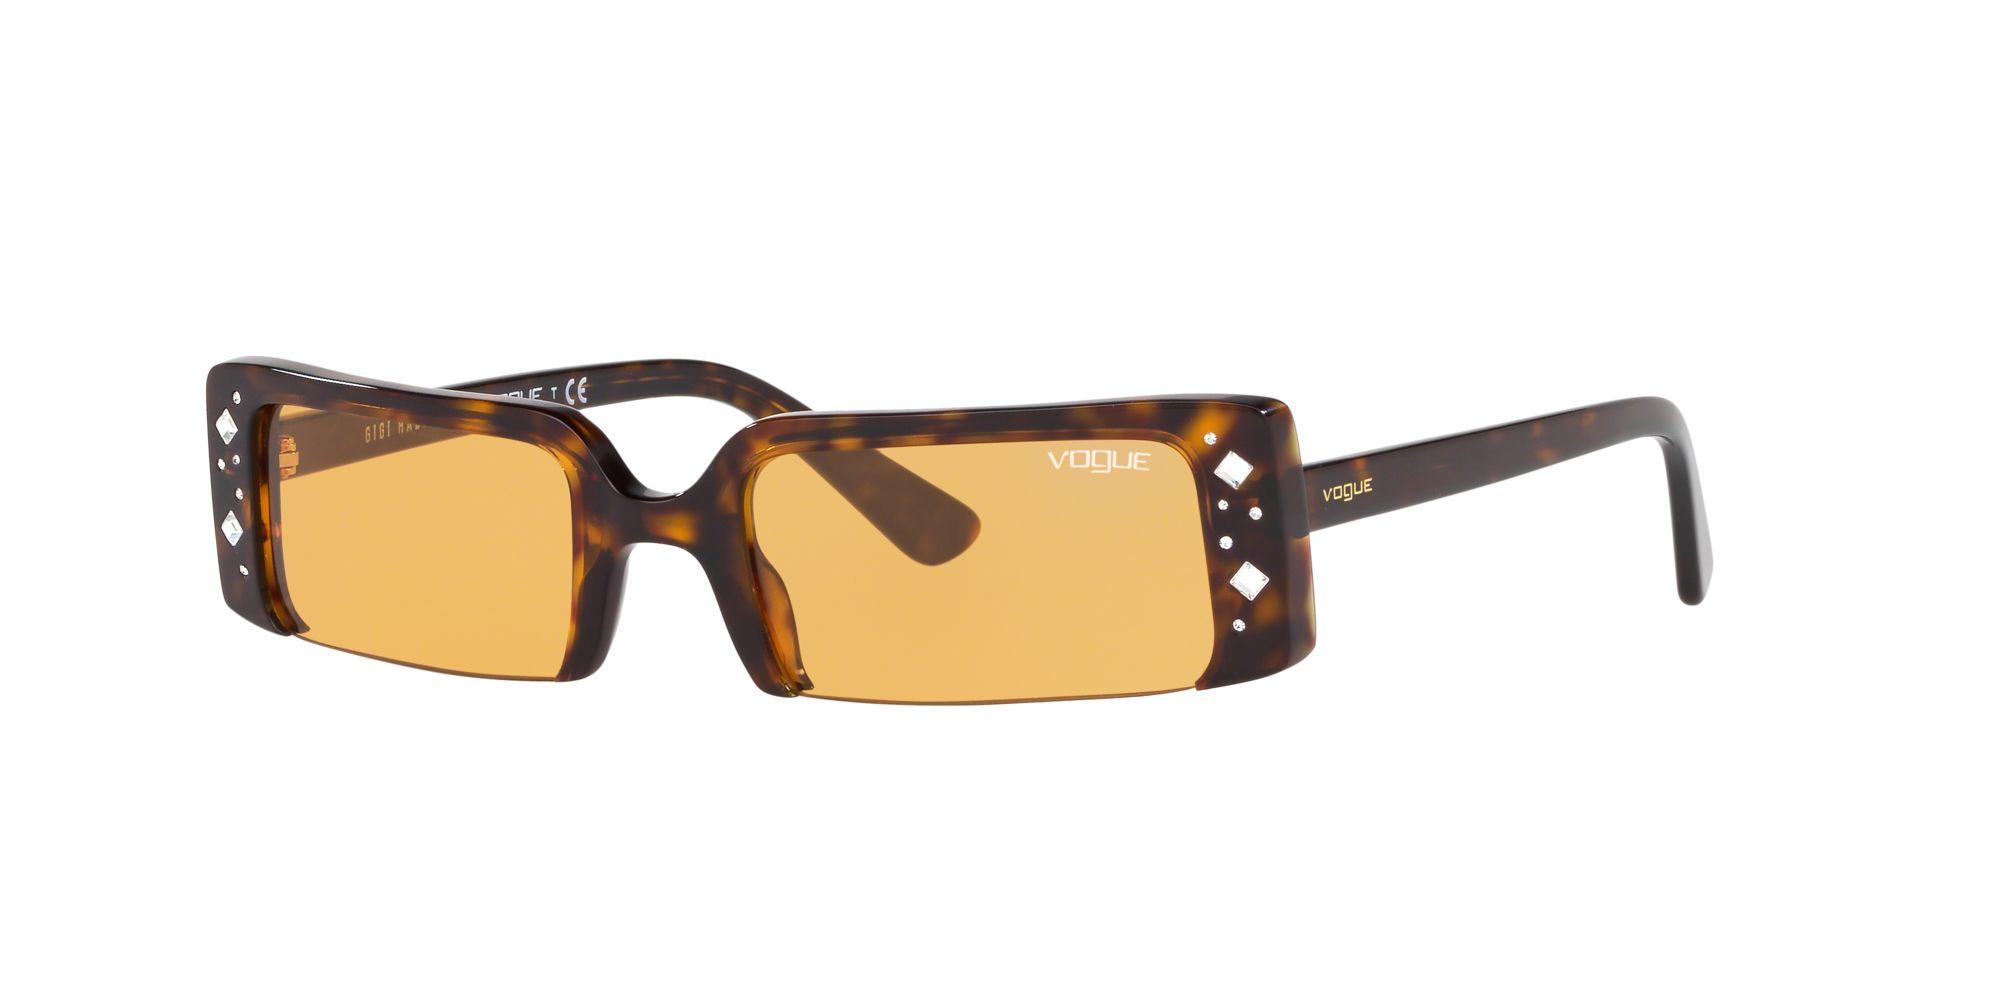 b884fe4db4 Sun New Arrivals VO5280SB - Dark Havana - Orange - Acetate